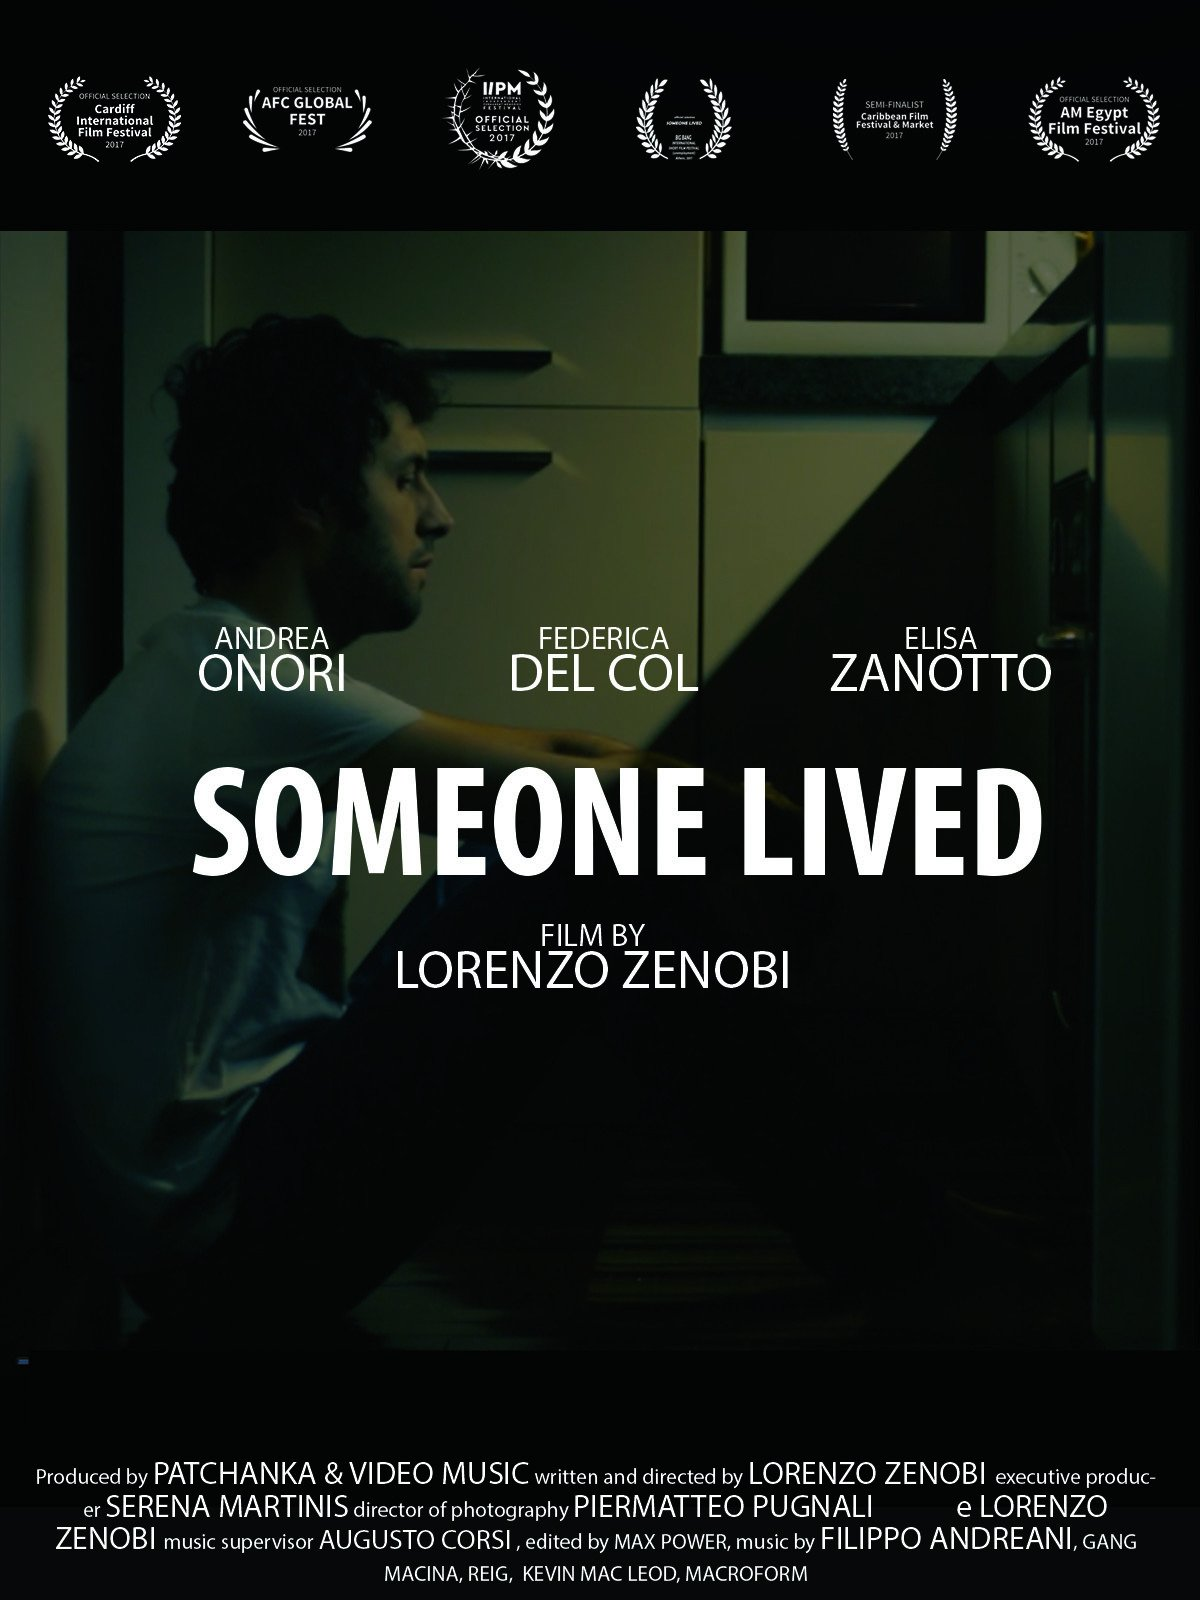 Someone lived